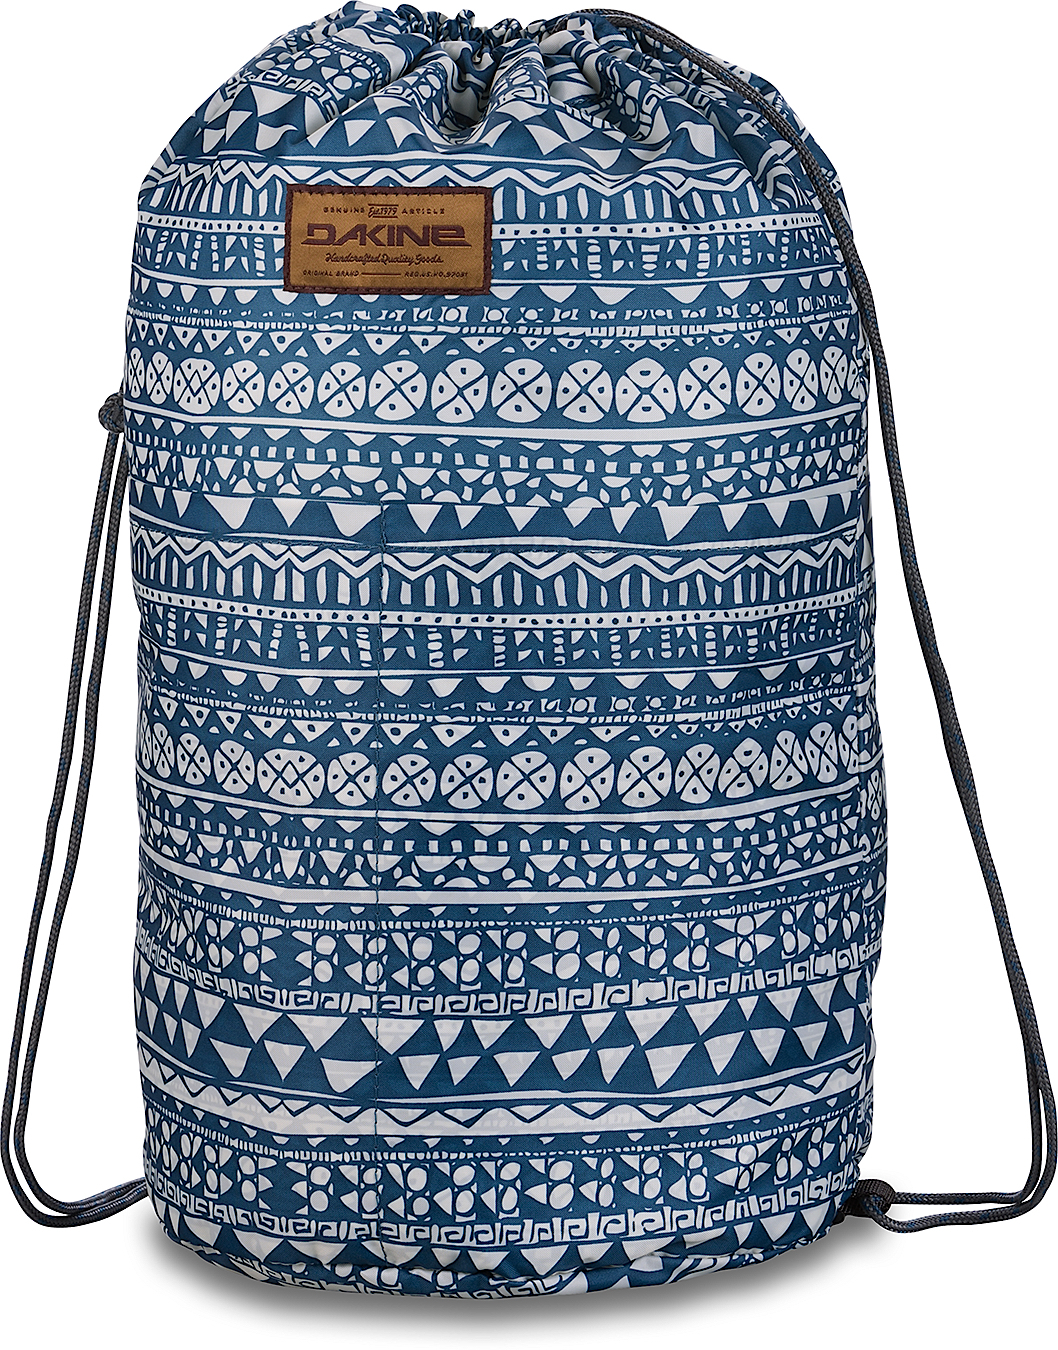 Рюкзаки водонепроницаемые Мешок рюкзак складной для обуви Dakine STASHABLE CINCHPACK MAKO 2015S-08130103-StashableCinchpack19L-Mako.jpg